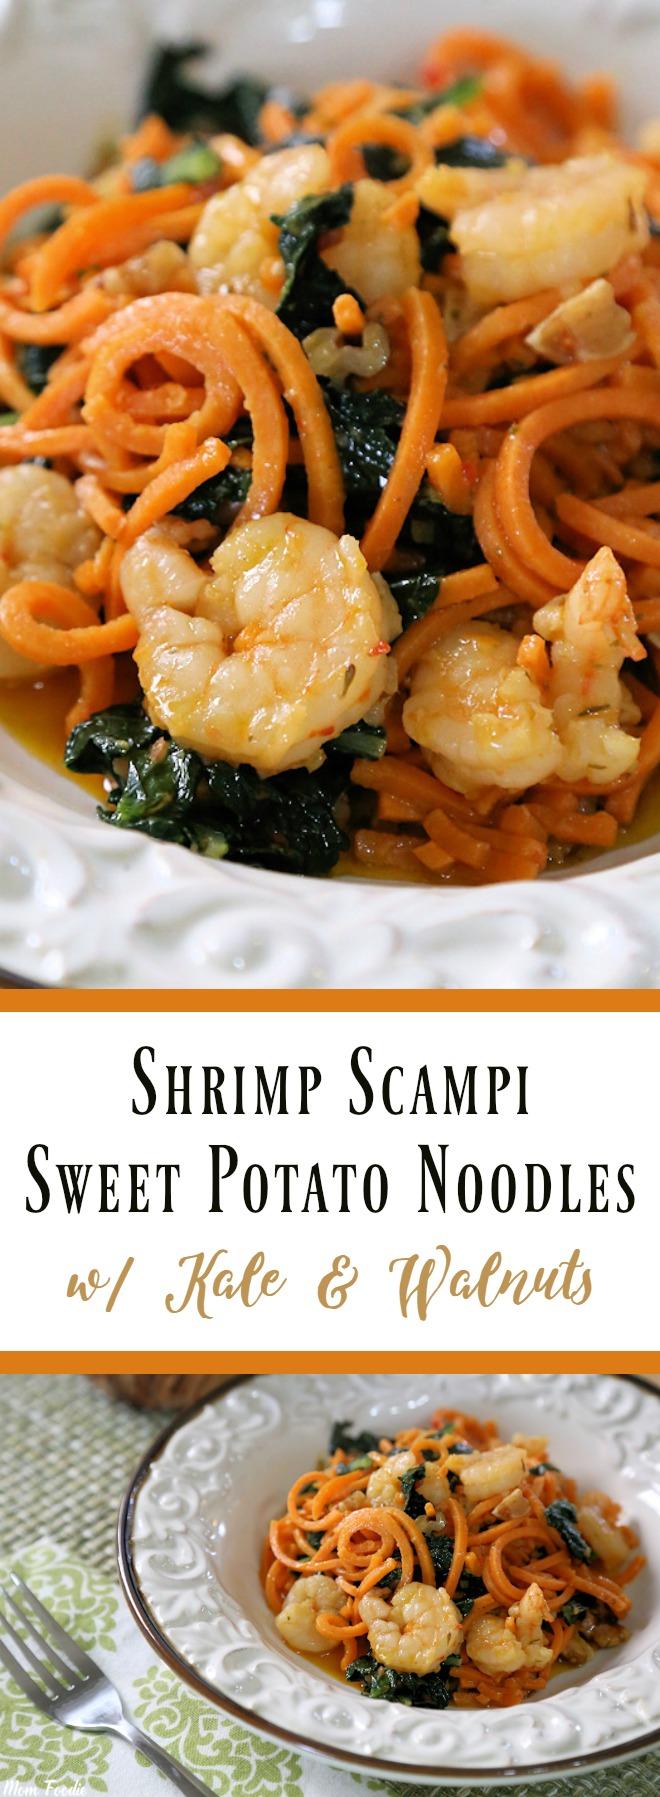 Shrimp Scampi Sweet Potato Noodles with Kale & Walnuts